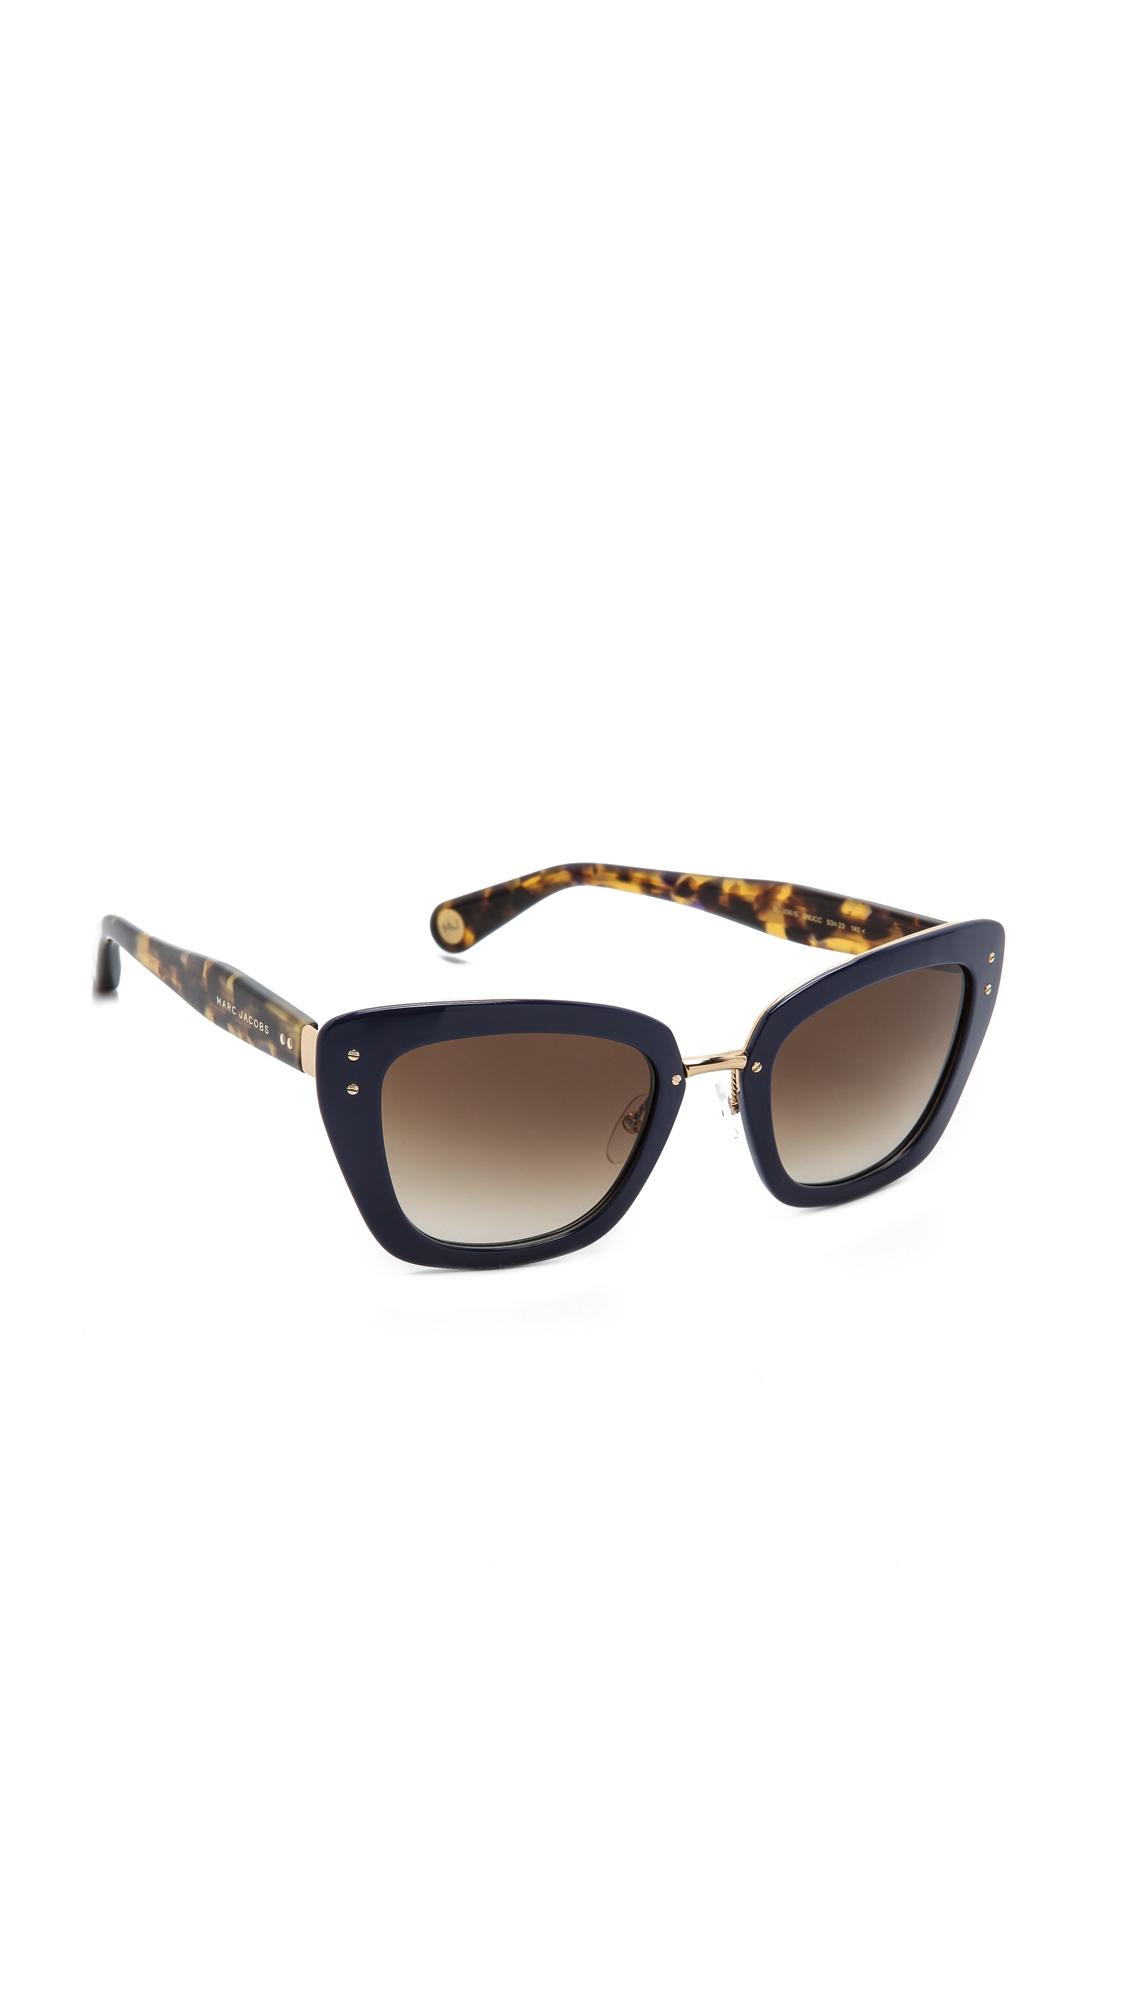 Frame Glasses Marc Jacobs : Marc Jacobs Sunglasses Thick Frame Sunglasses SHOPBOP